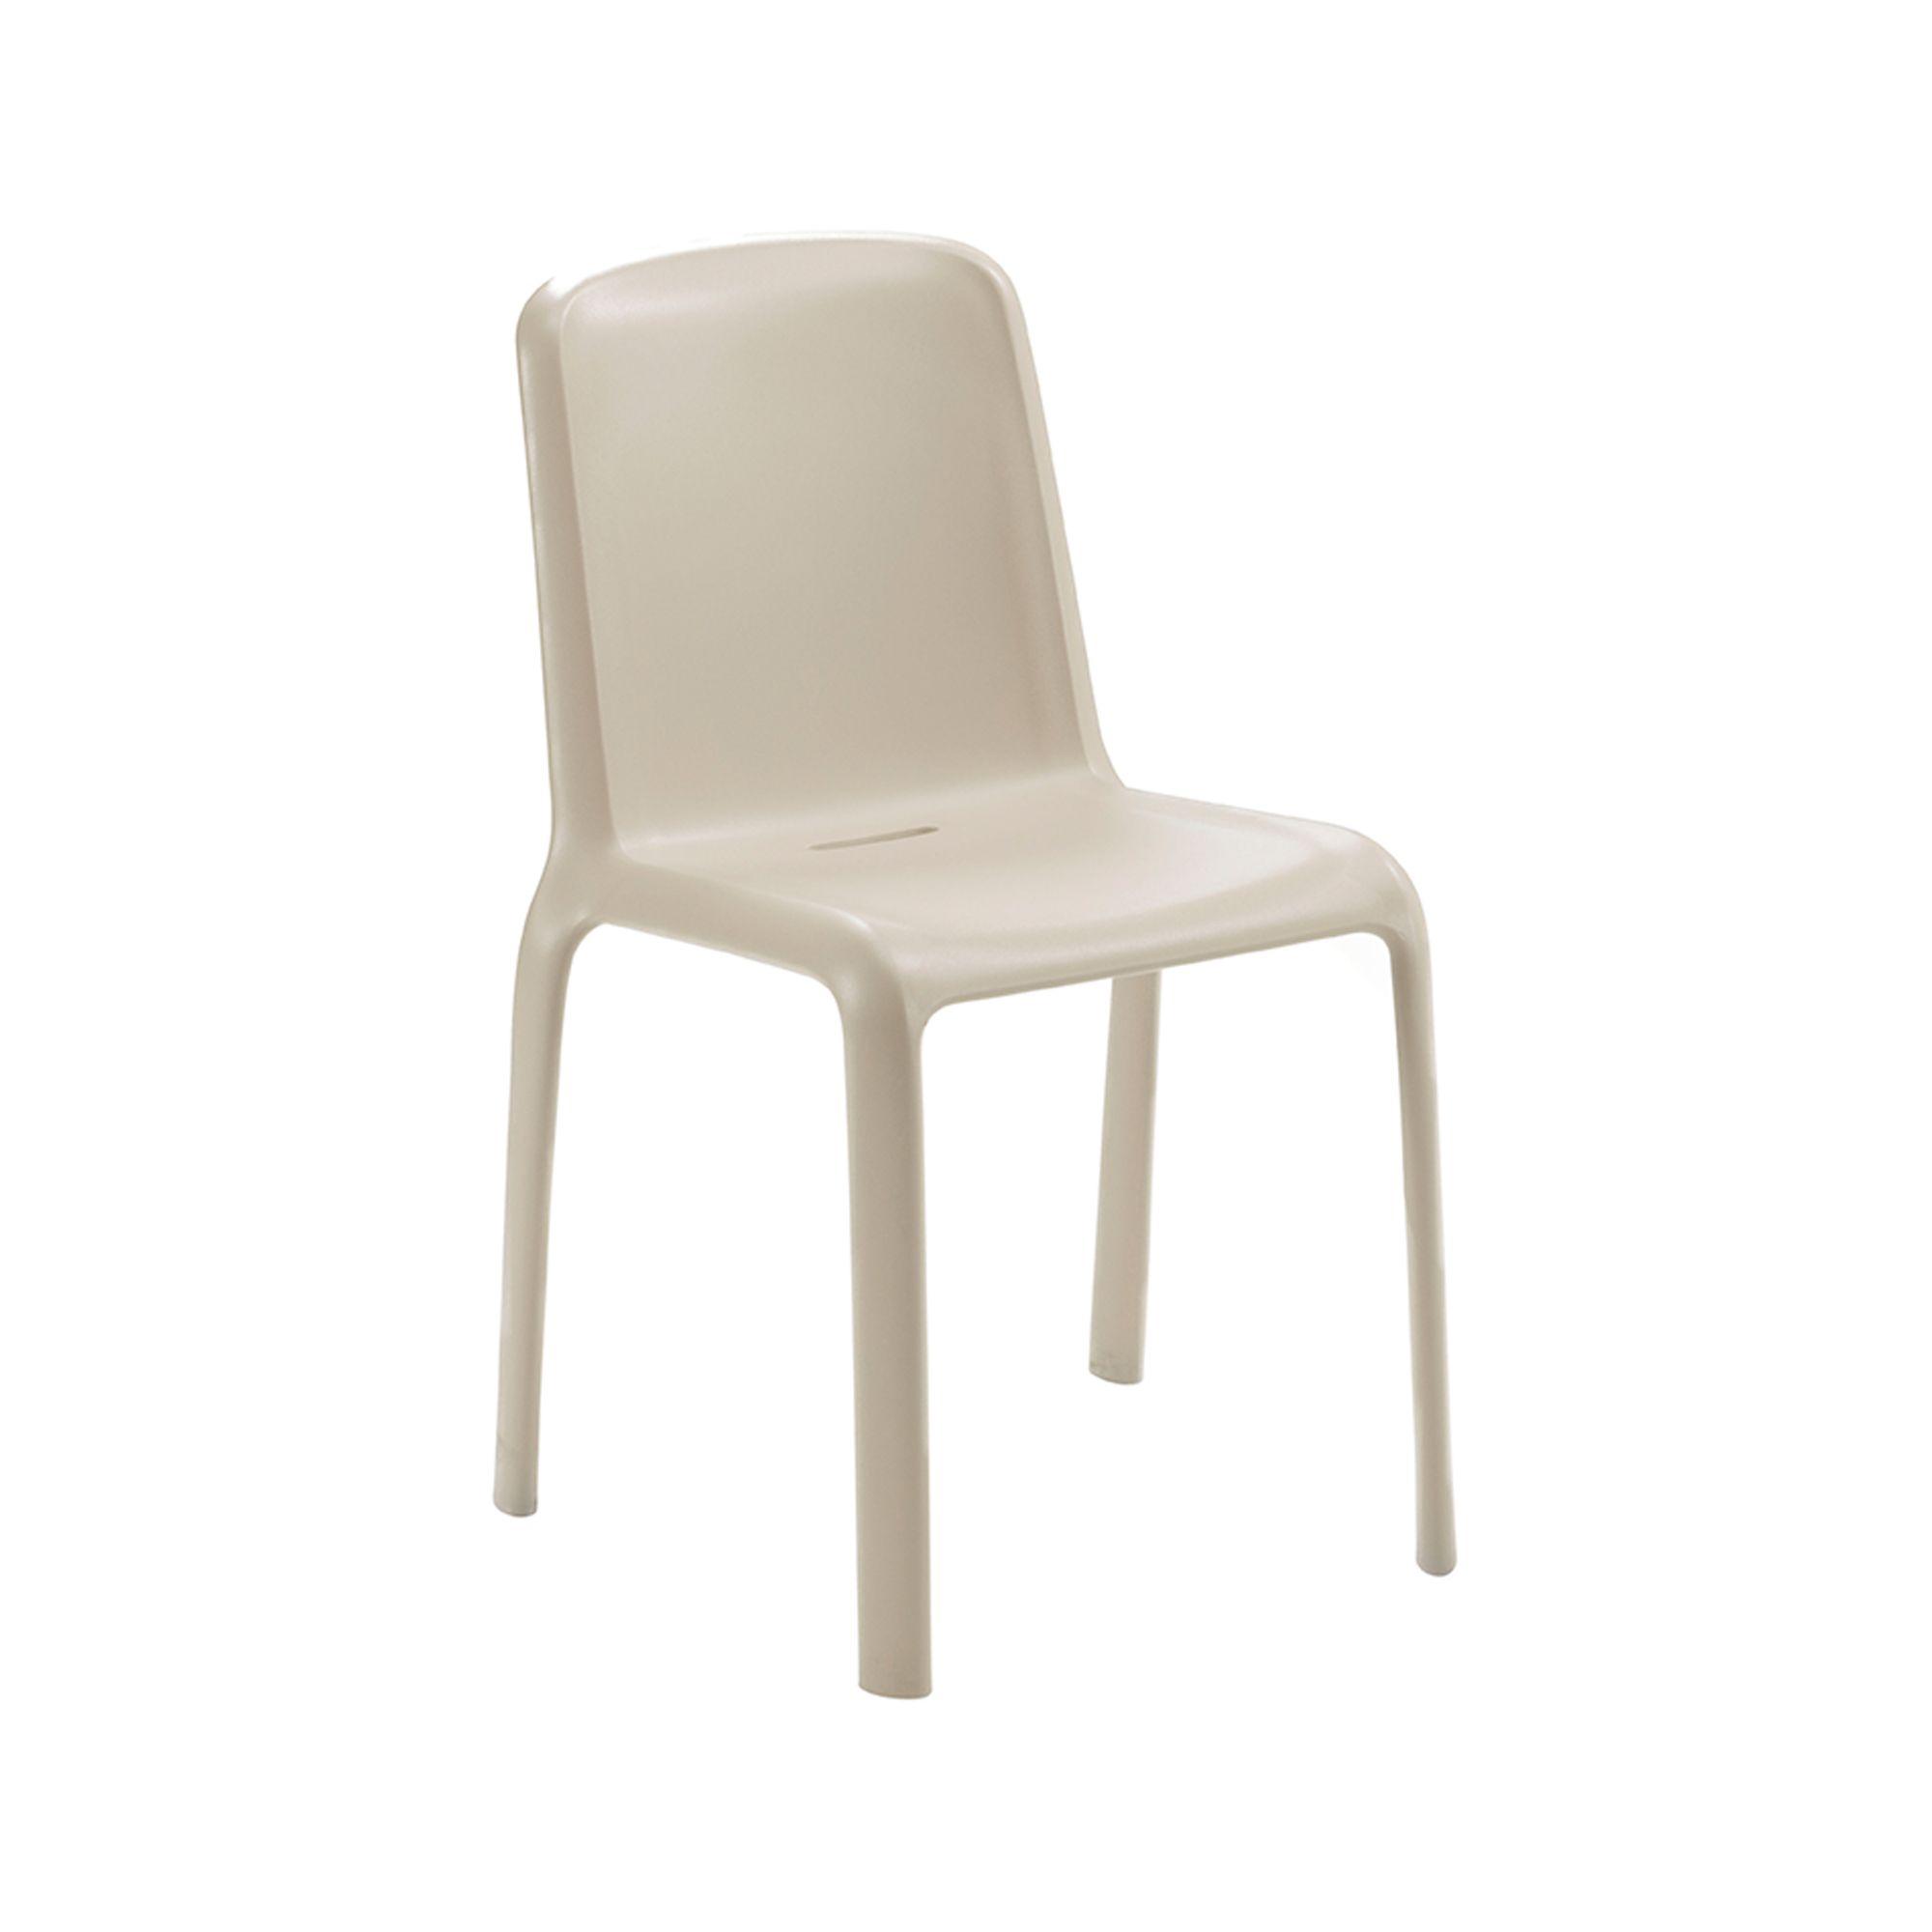 Model 173 chair in modern style